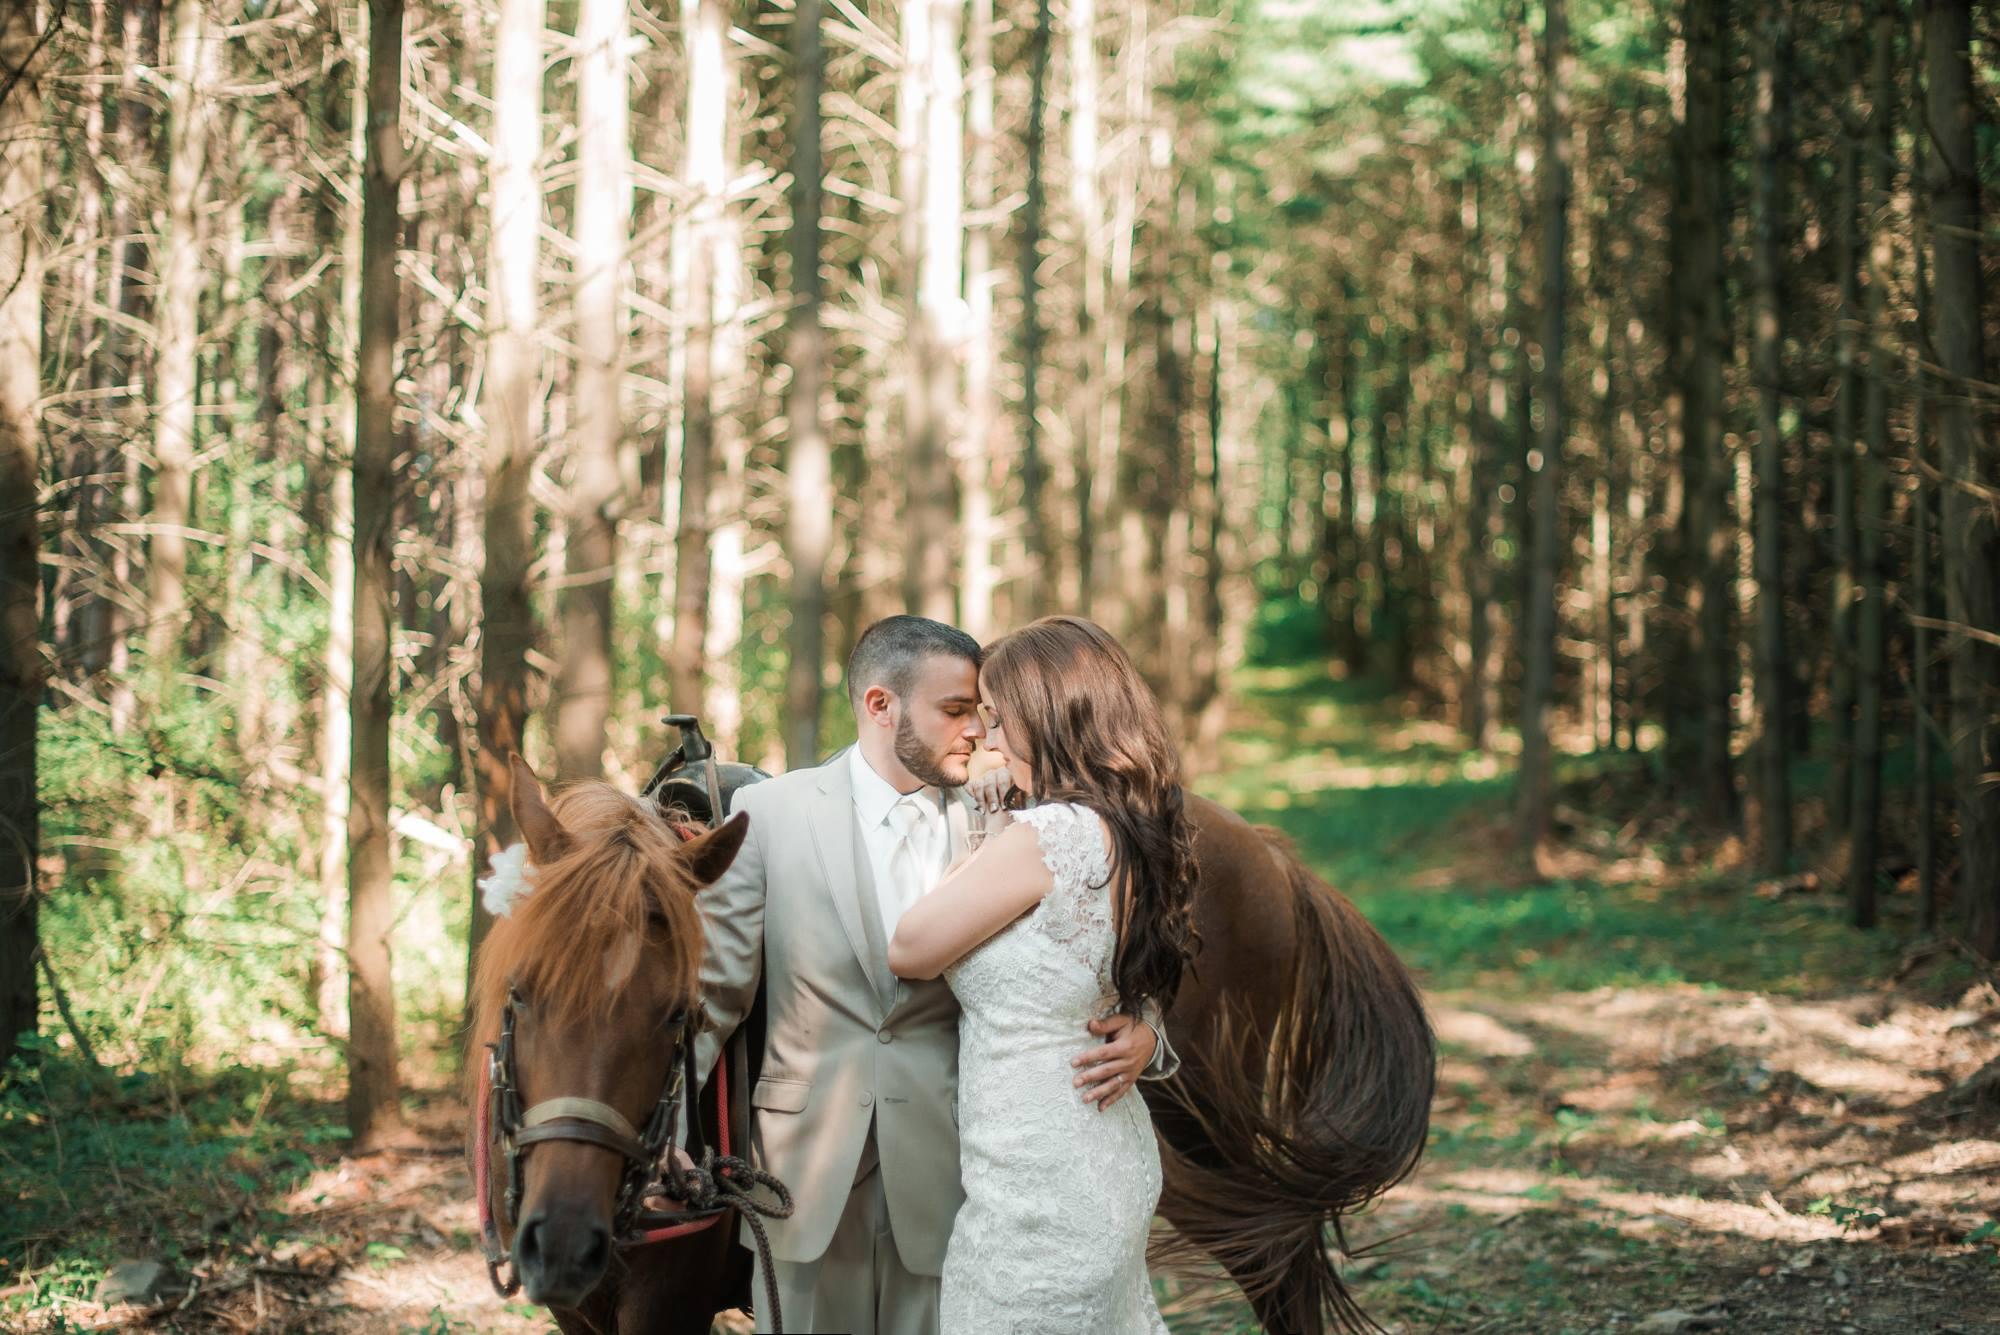 horizon-view-farms-pennsylvania-wedding-barn-rustic-country-0013.jpg